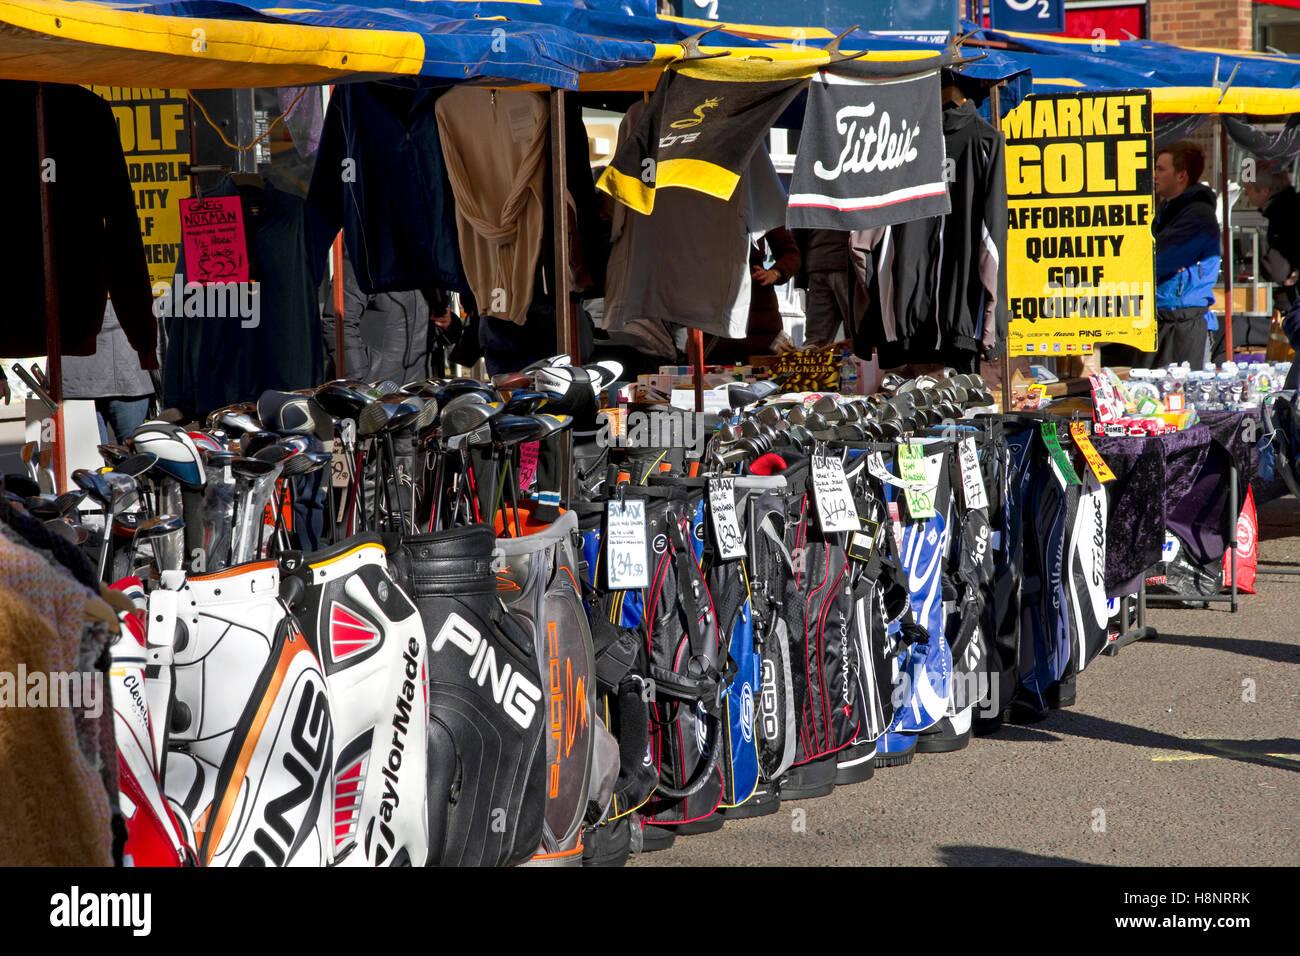 Golf equipment stall at St Albans Market, St Peters Street, St Albans, Hertfordshire, England, UK - Stock Image